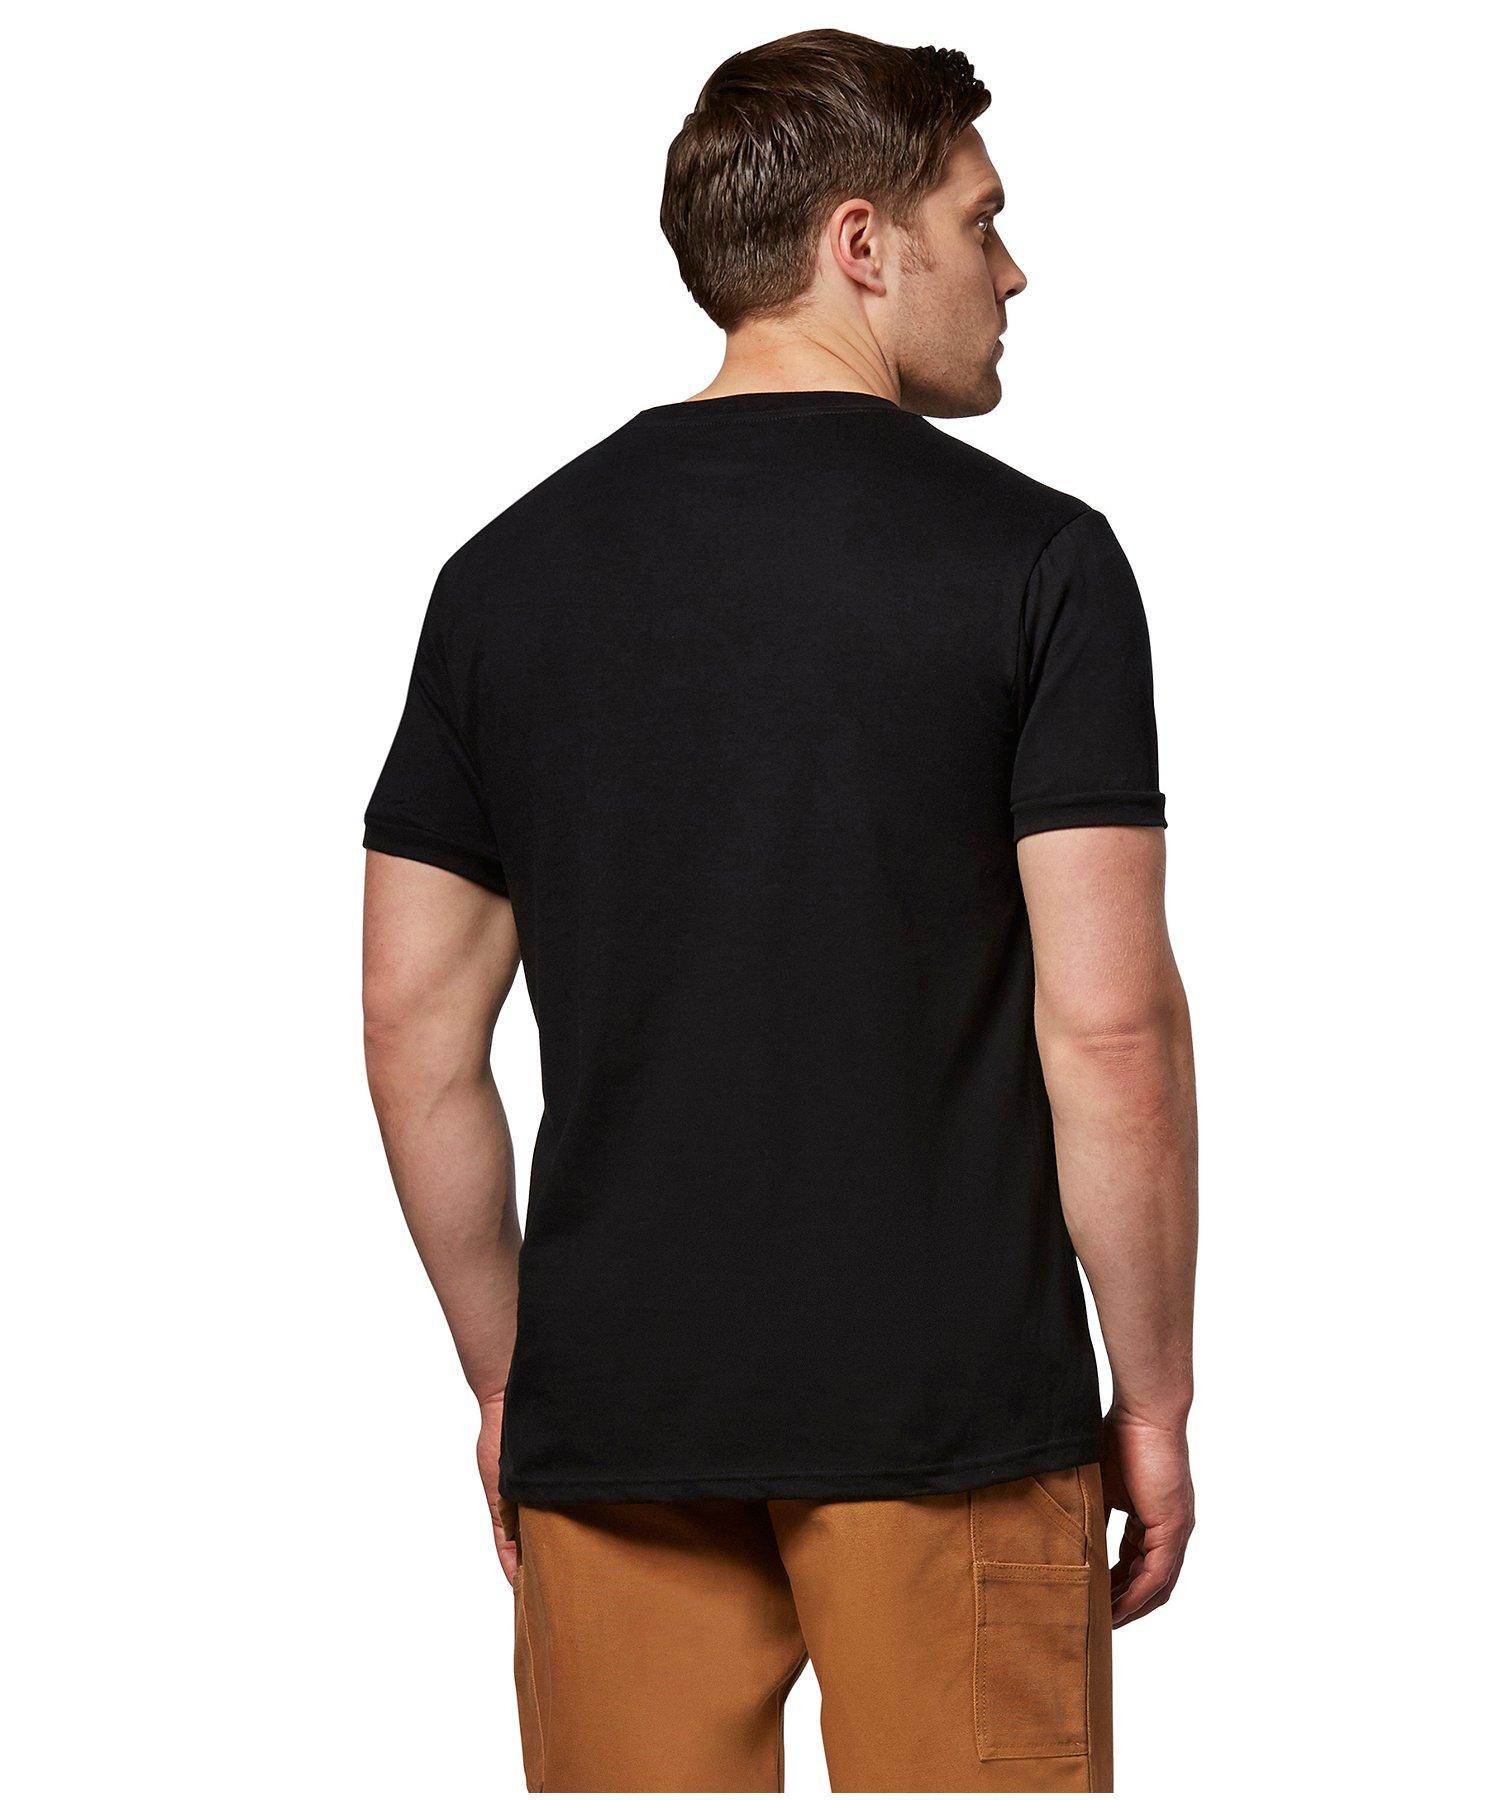 $100 32 DEGREES COOL Men/'s PAJAMA BLACK SOLID T-SHIRT SOFT LOUNGE SLEEPWEAR XXL